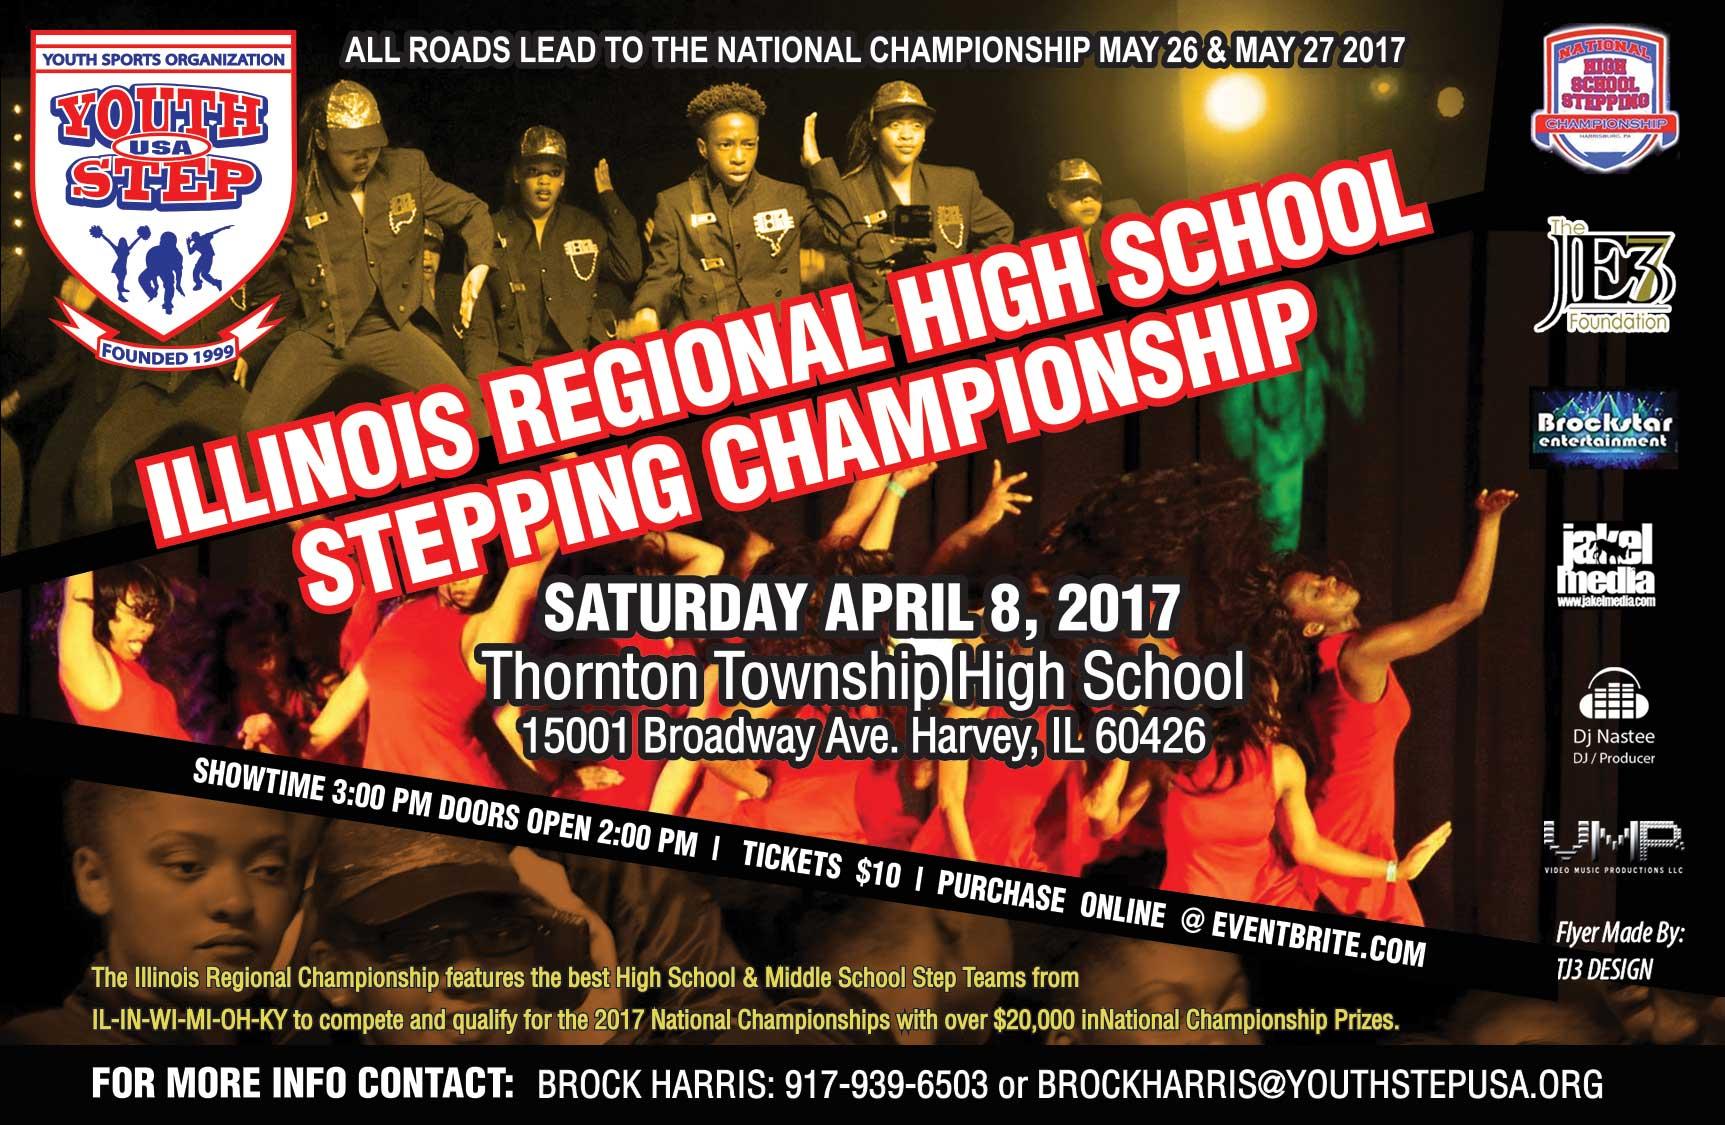 Illinois Regional High School Stepping Championship